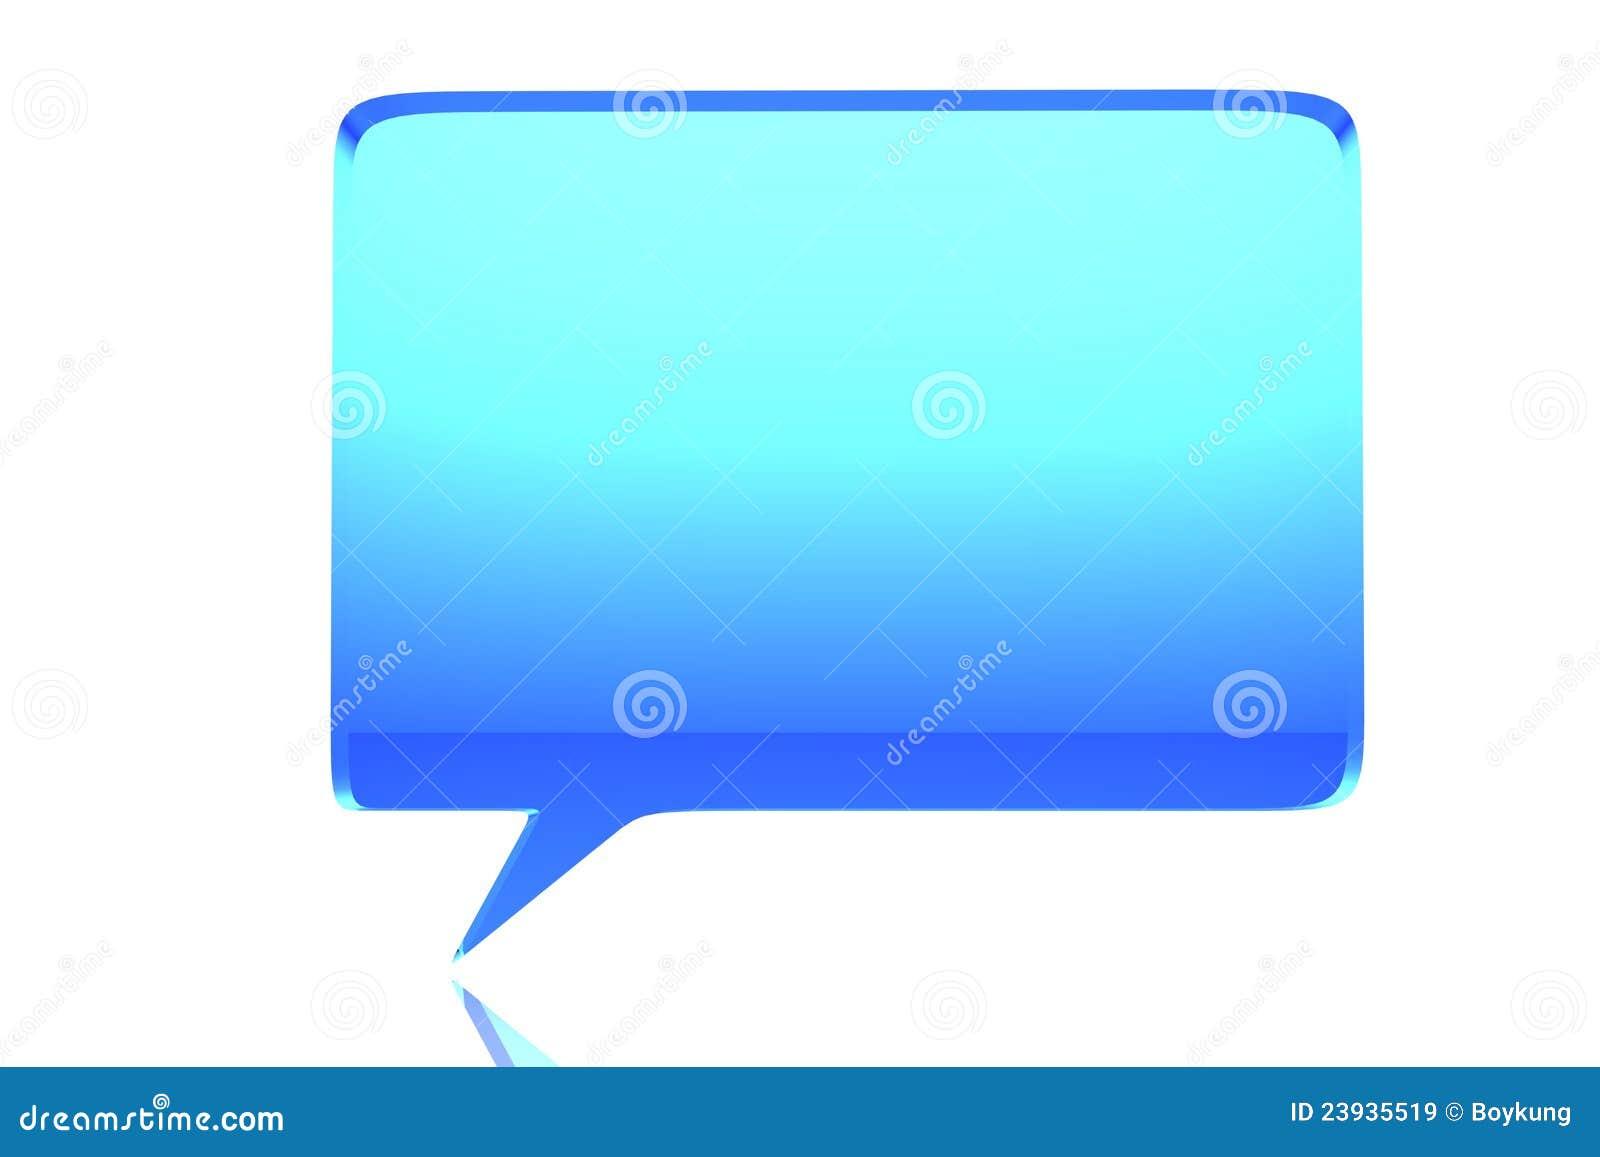 Icq Chat Rooms Ipad